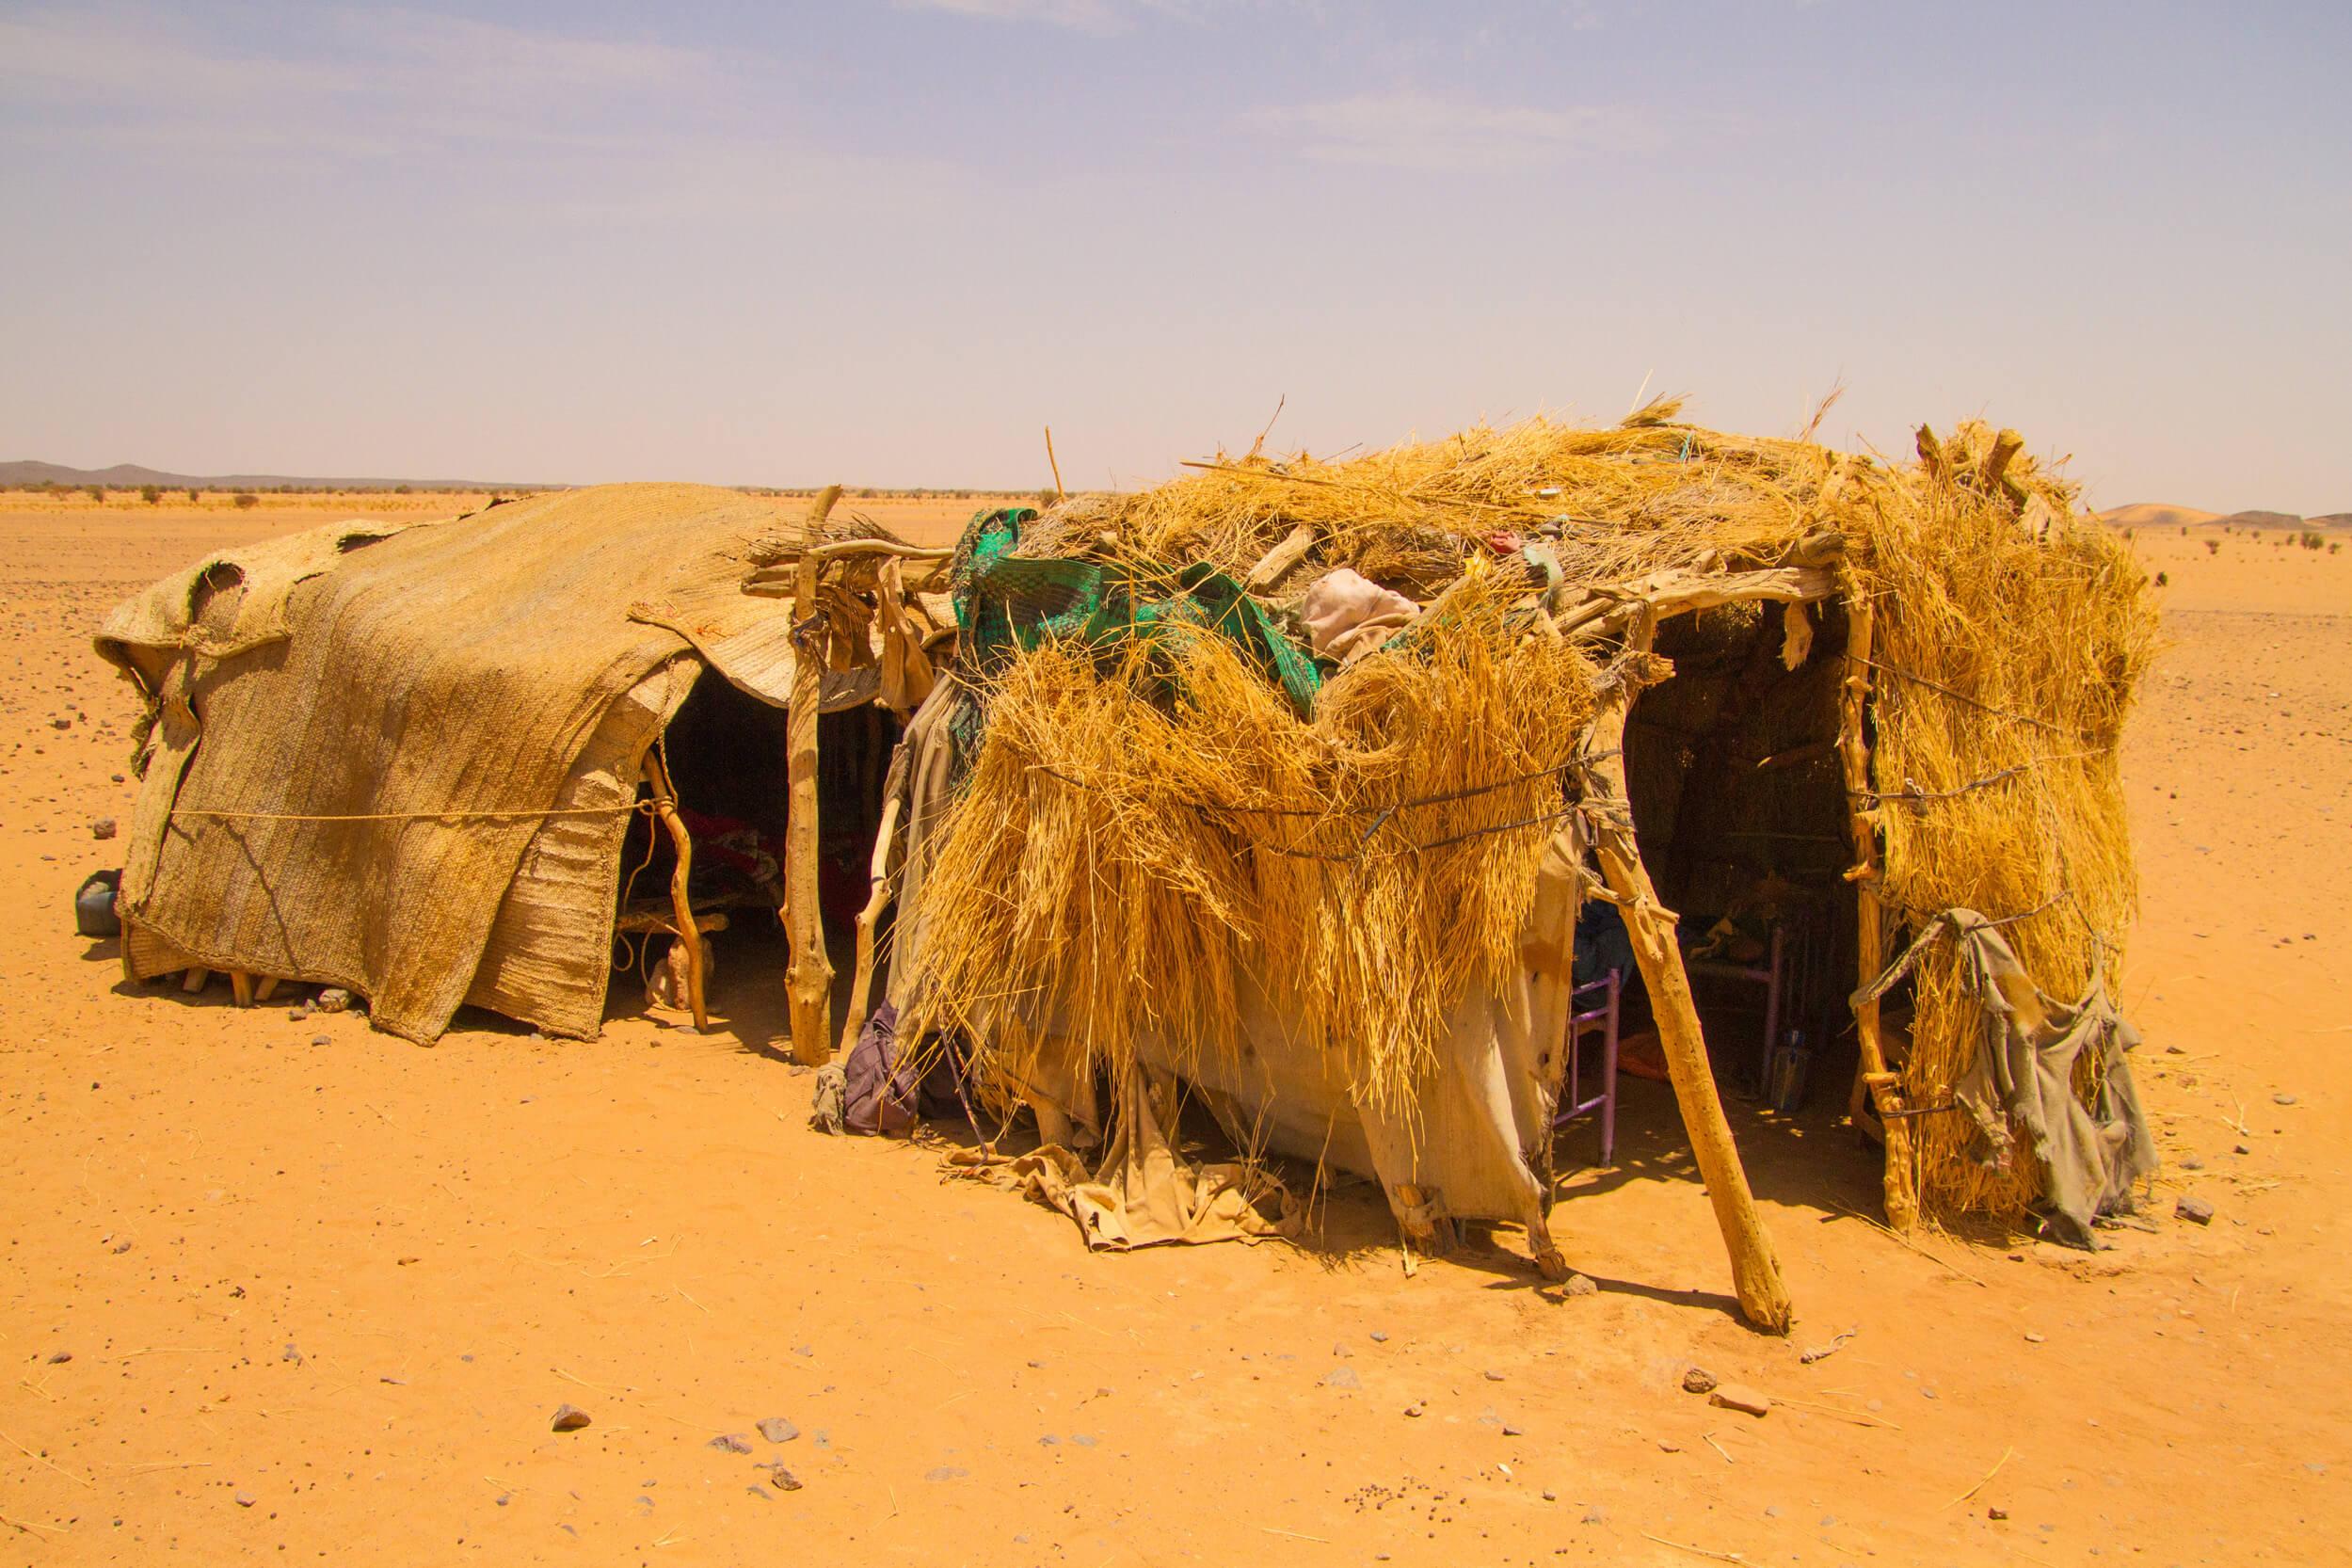 https://bubo.sk/uploads/galleries/7407/marekmeluch_sudan_bayudadesertnomads1.jpg